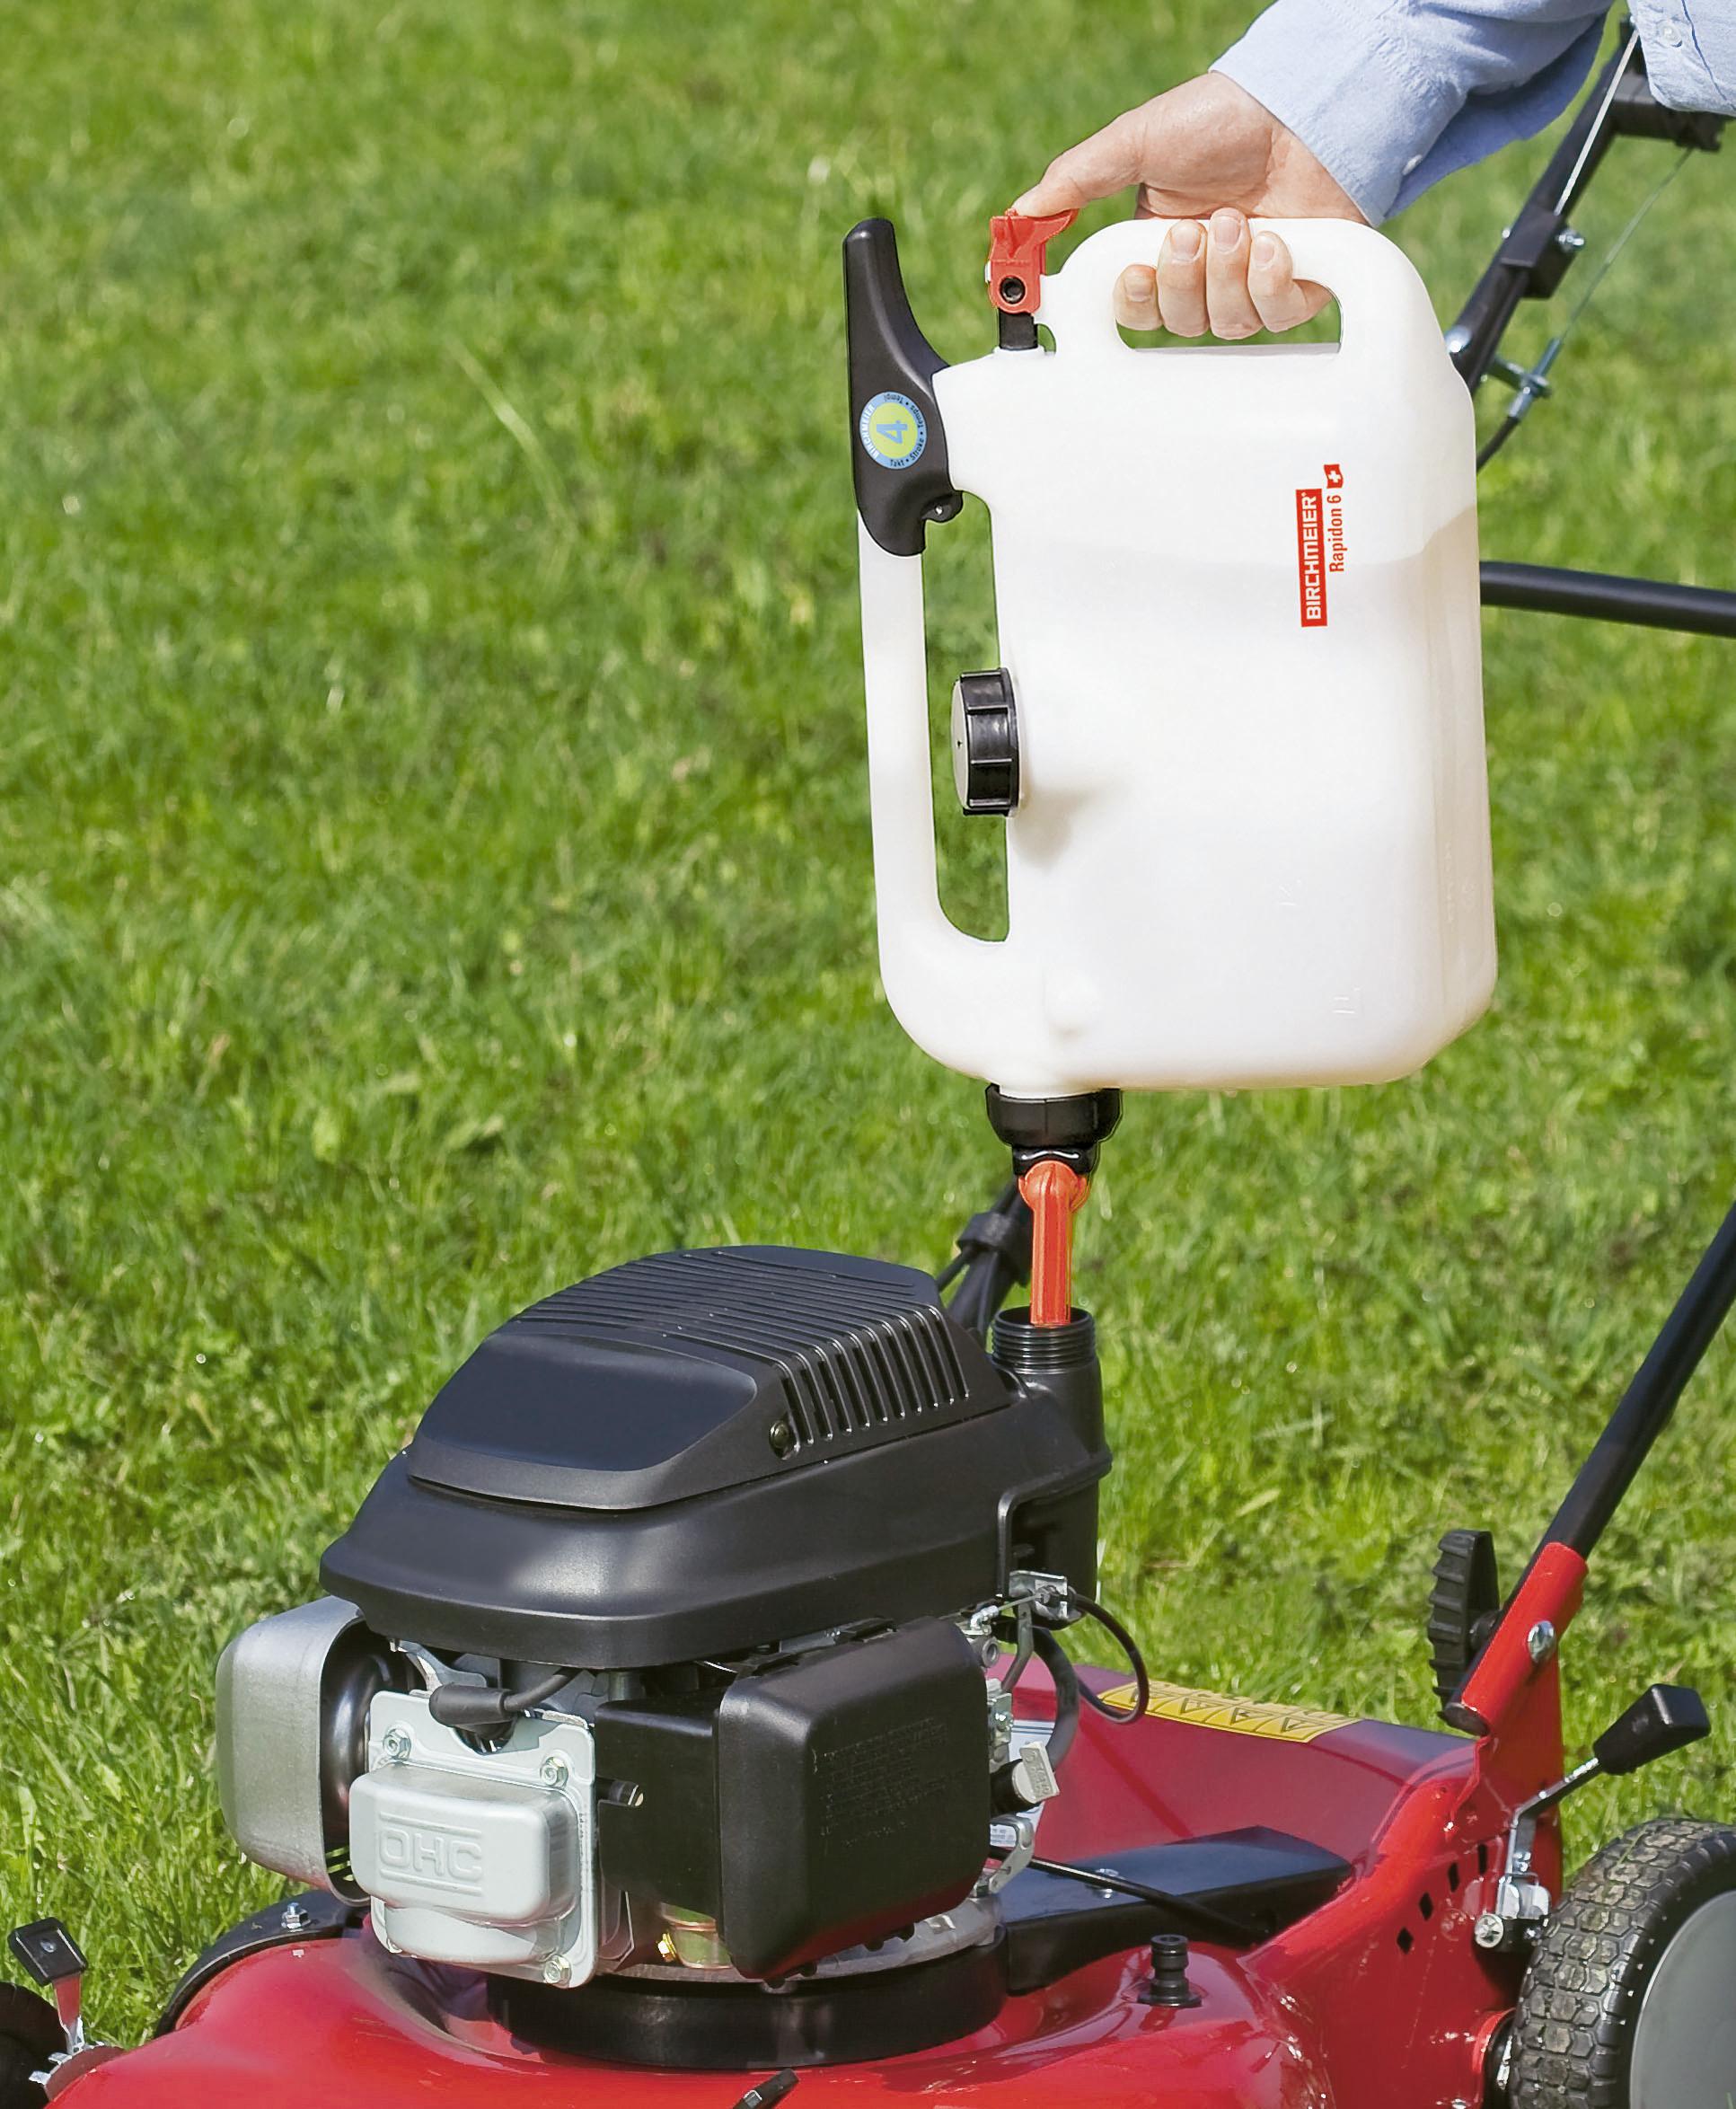 Birchmeier - the swiss manufacturer of spraying equipment